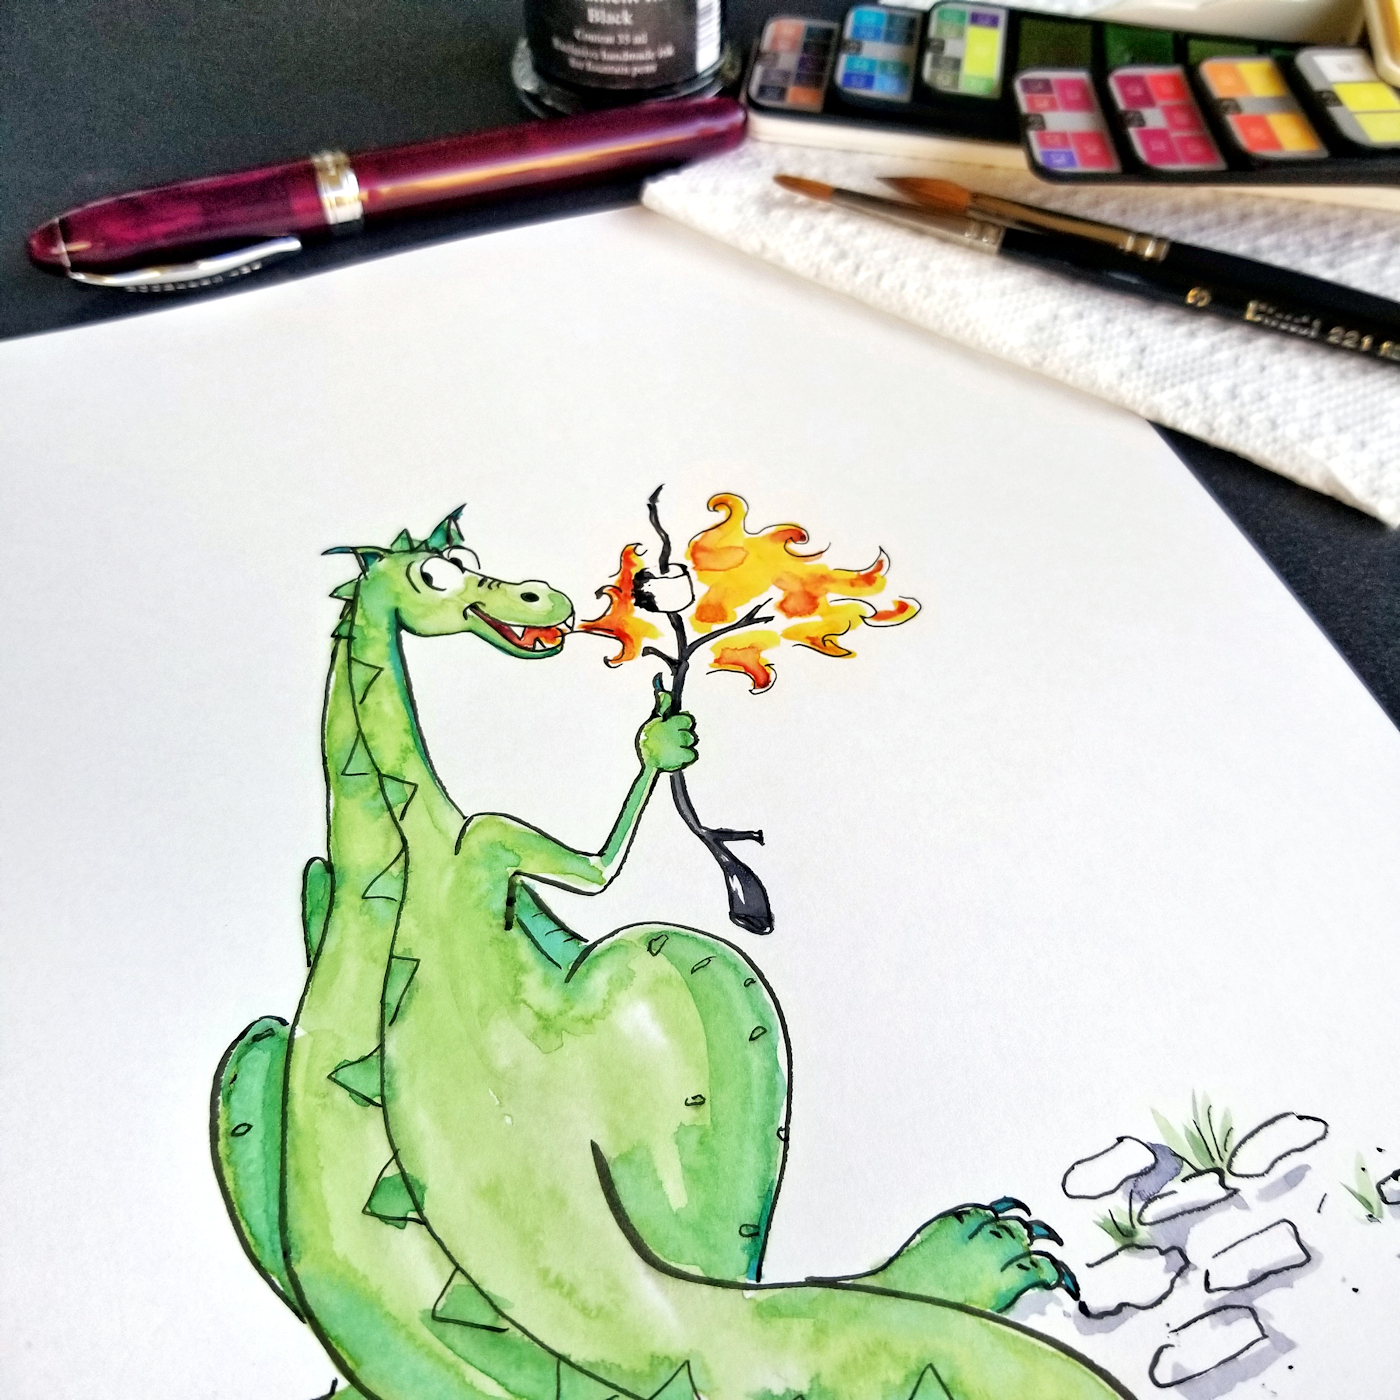 JMSC-179 S'Mores photo of original illustration by Joana Miranda - Detail1